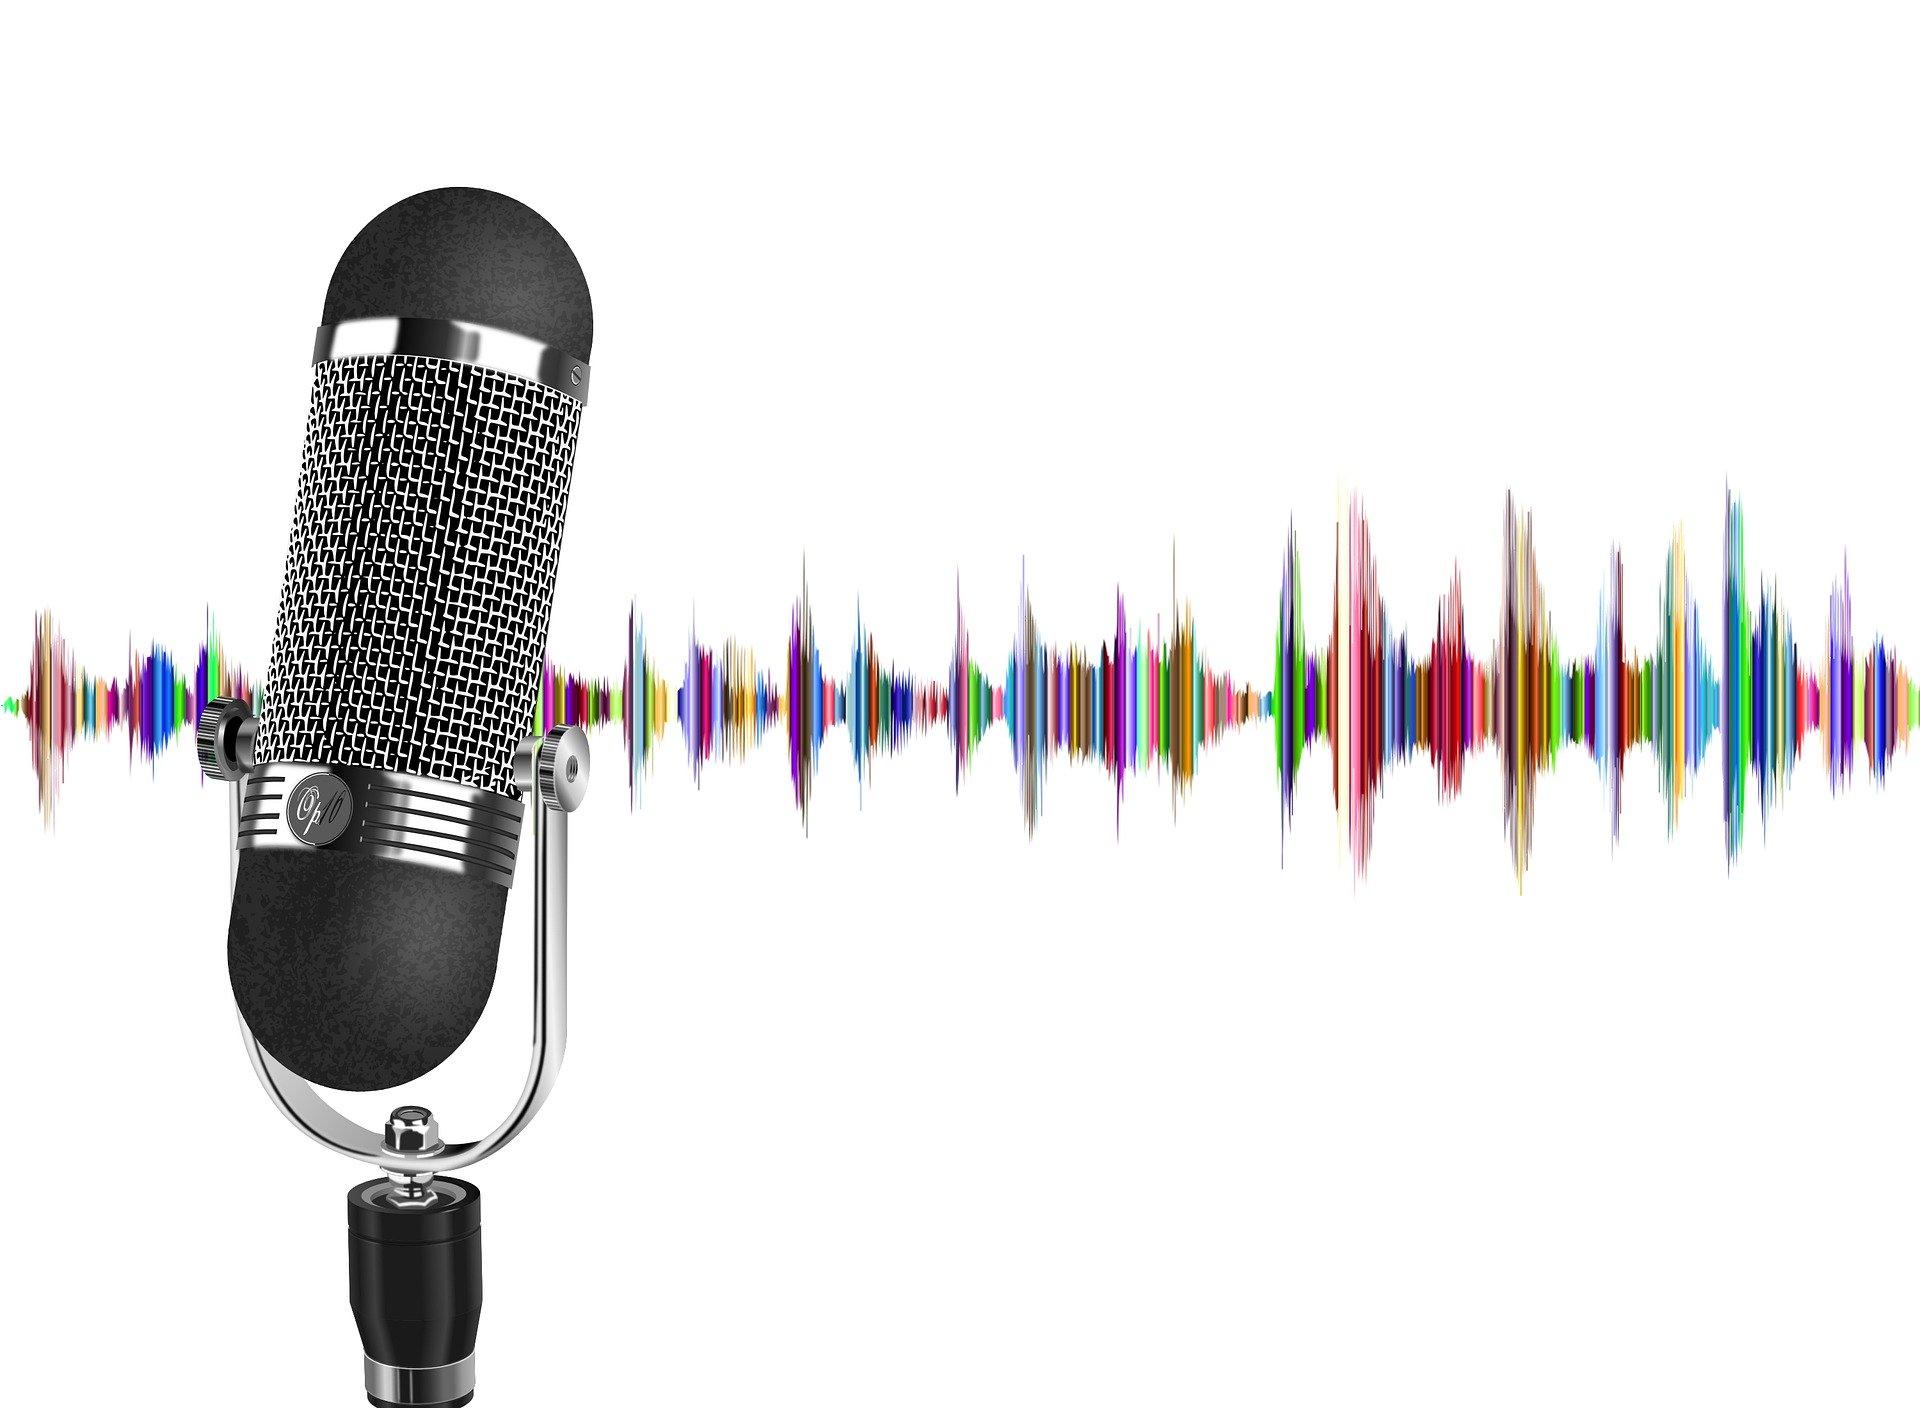 comunicacion oratoria feedback emocional